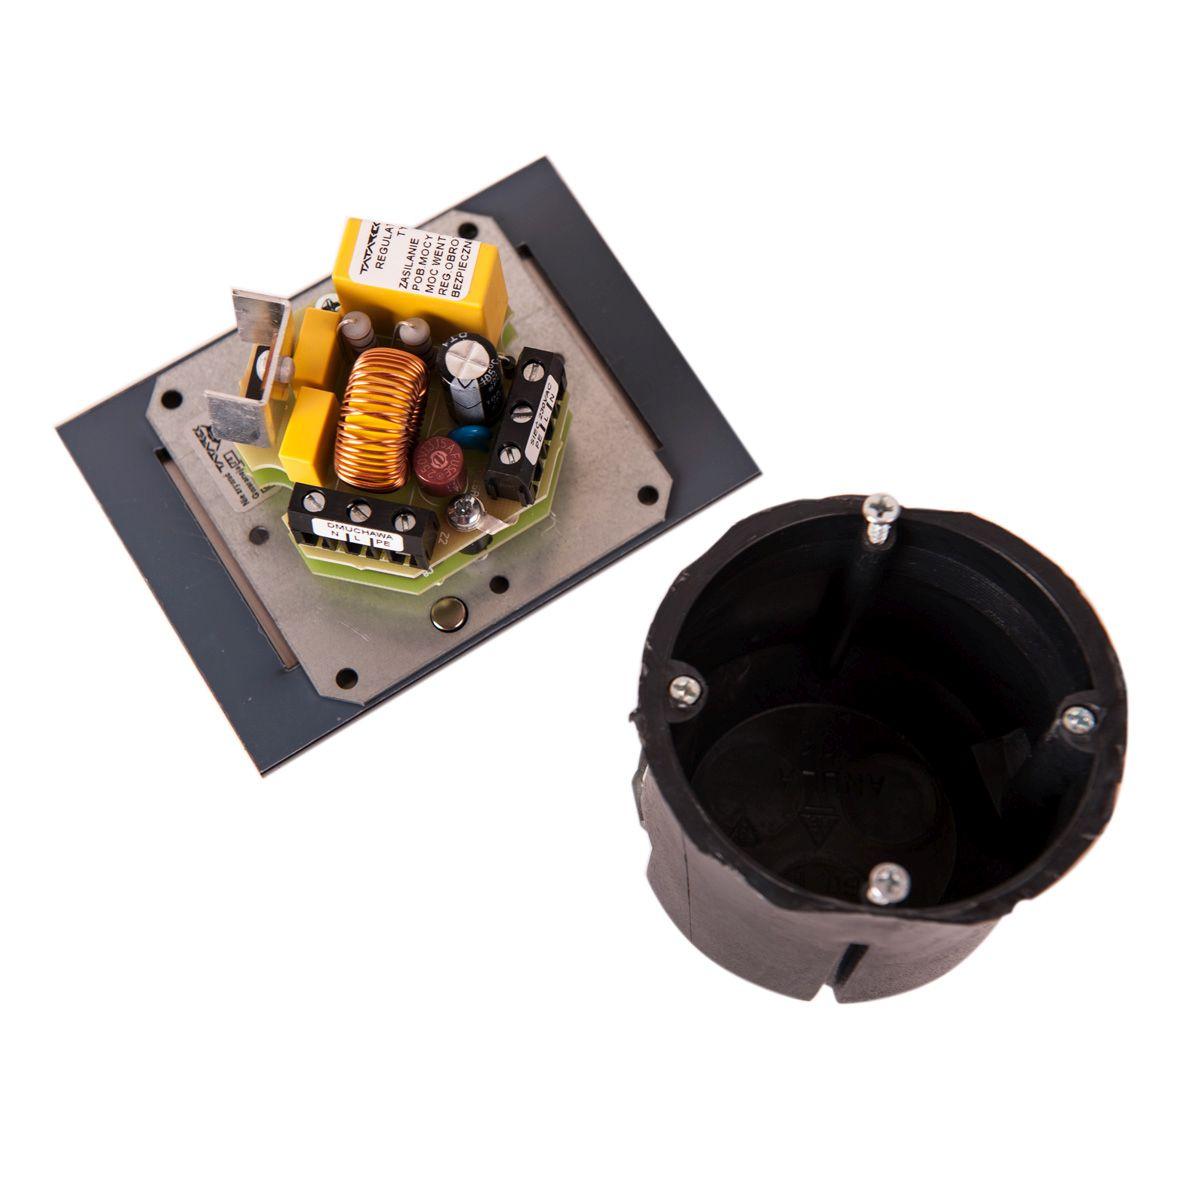 Regulátor otáček ventilátoru RT-10L titanium (do zdi)